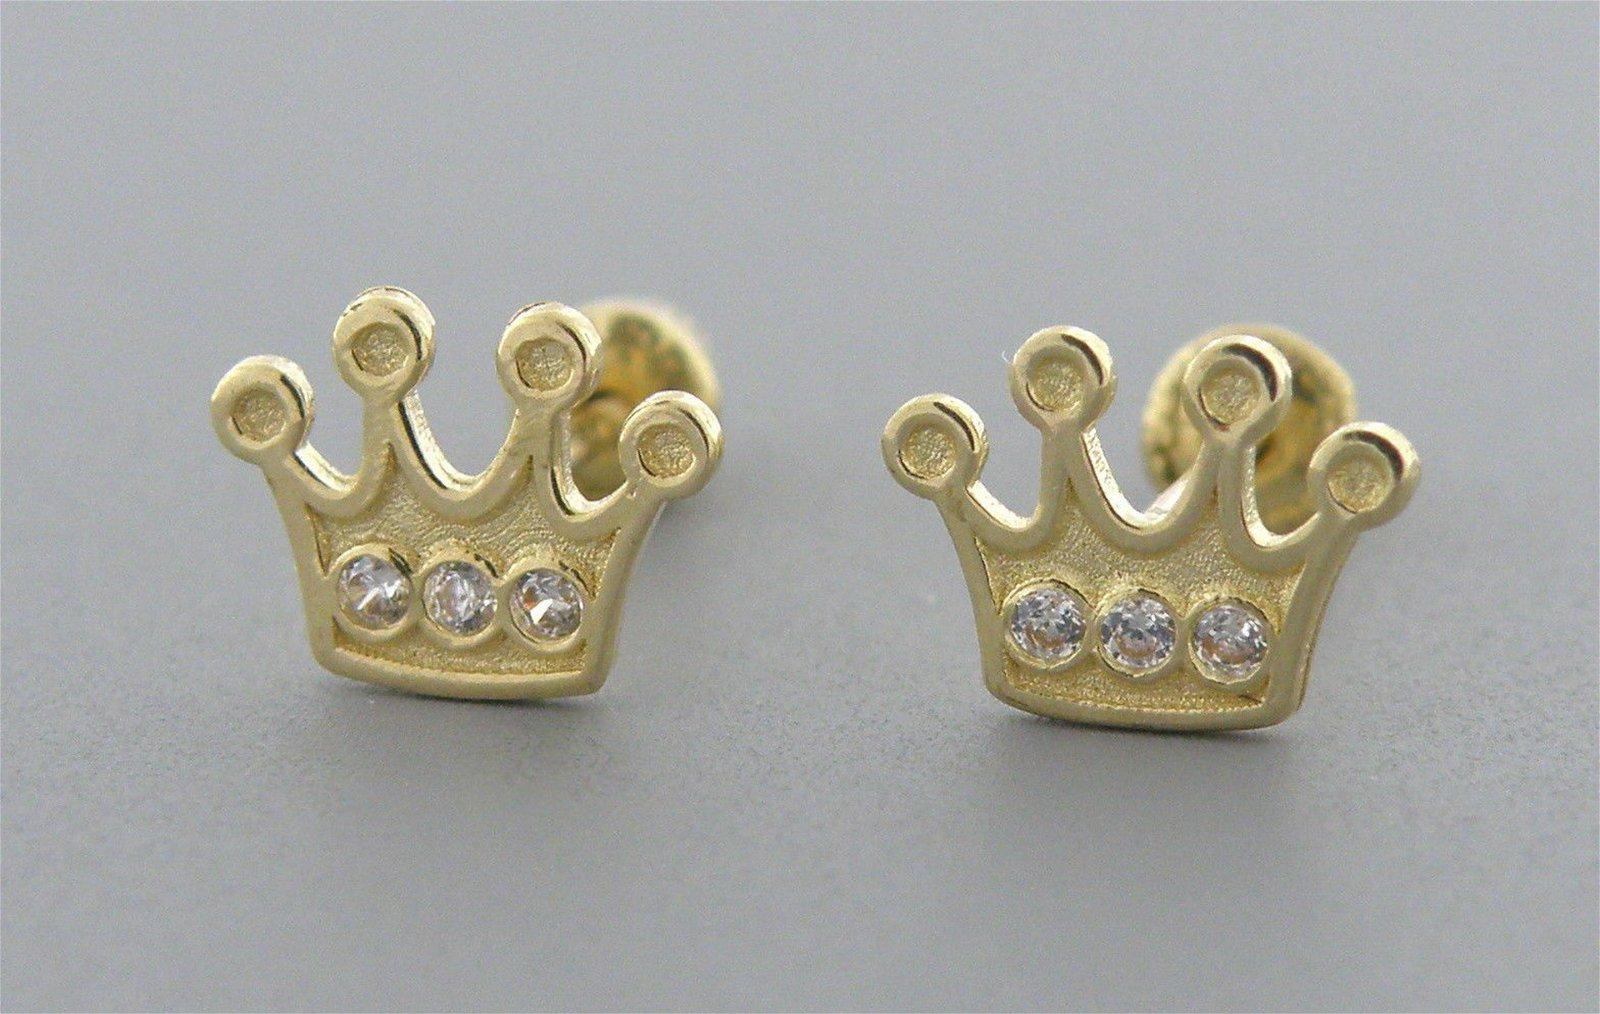 14K YELLOW GOLD CZ GIRLS BABY STUD TIARA CROWN EARRINGS